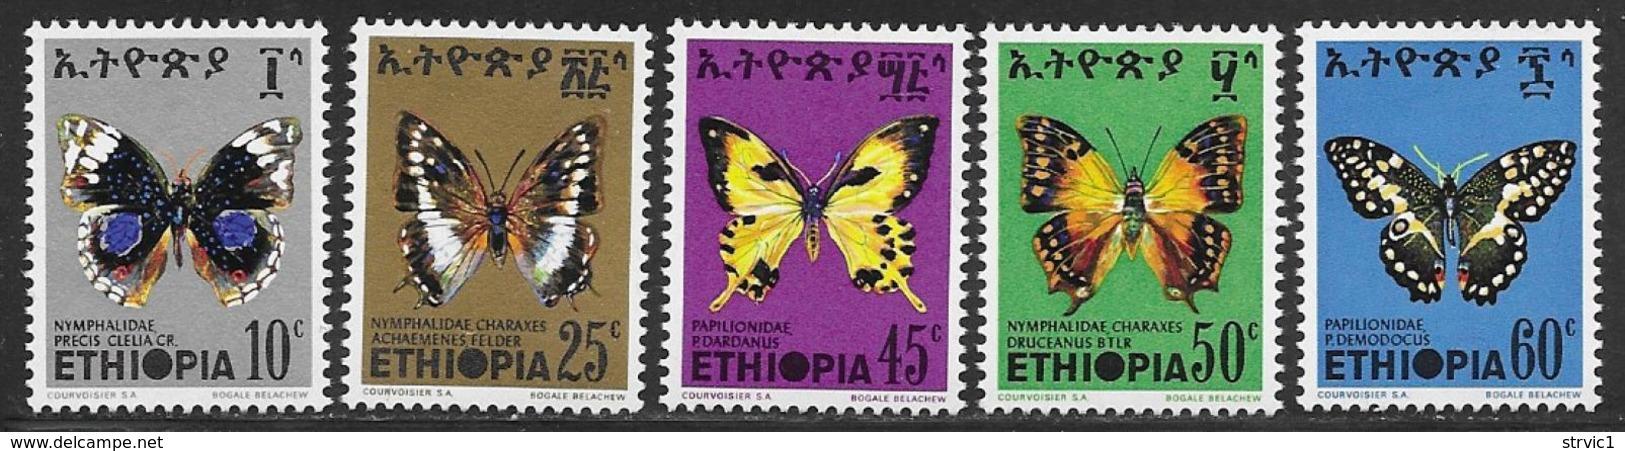 Ethiopia Scott # 720-4 MNH Butterflies, 1975 - Ethiopia